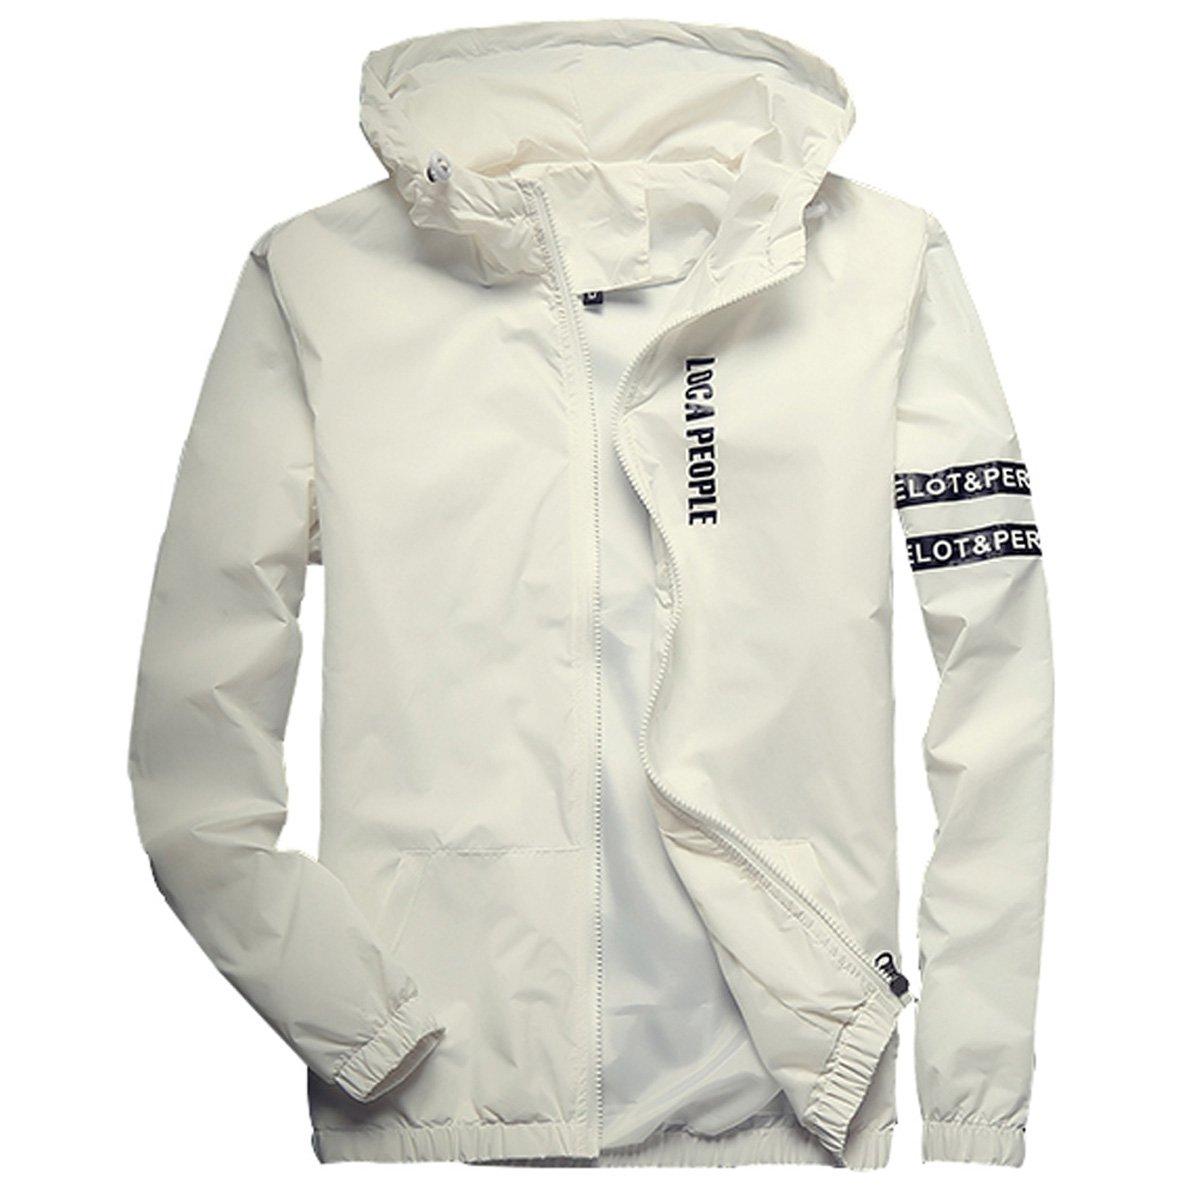 Homaok Men's Lightweight Breathable Jacket Medium White by Homaok